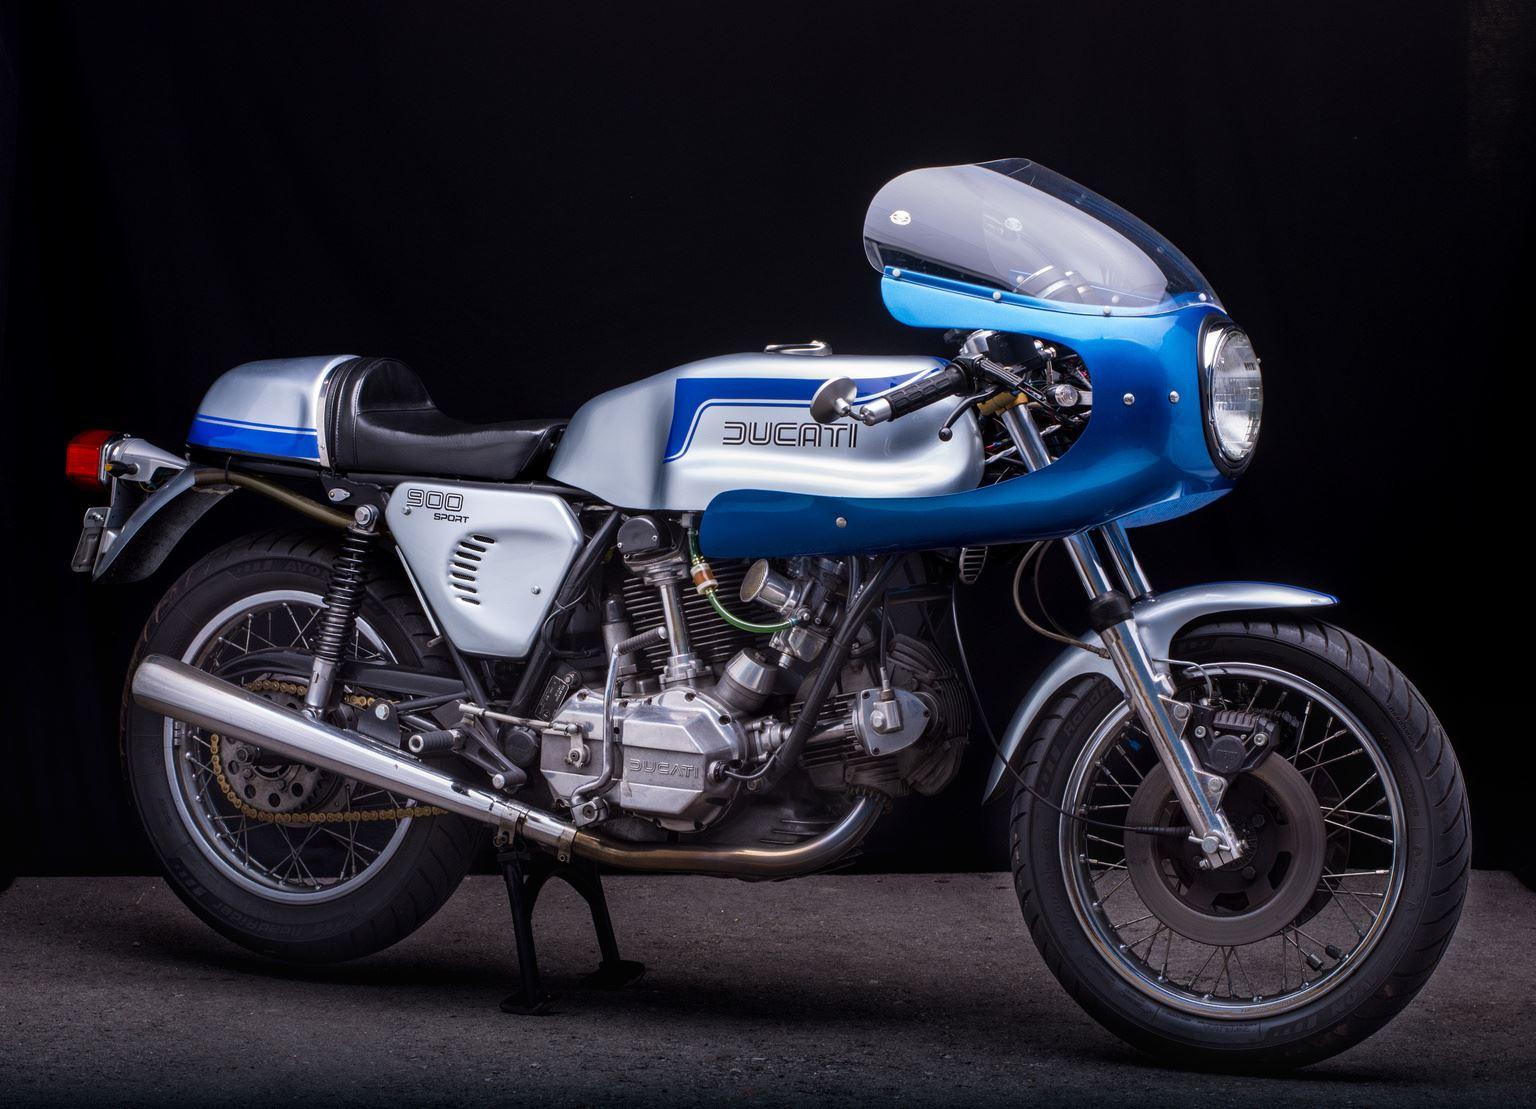 Ducati 900SS Replica - Under Restoration